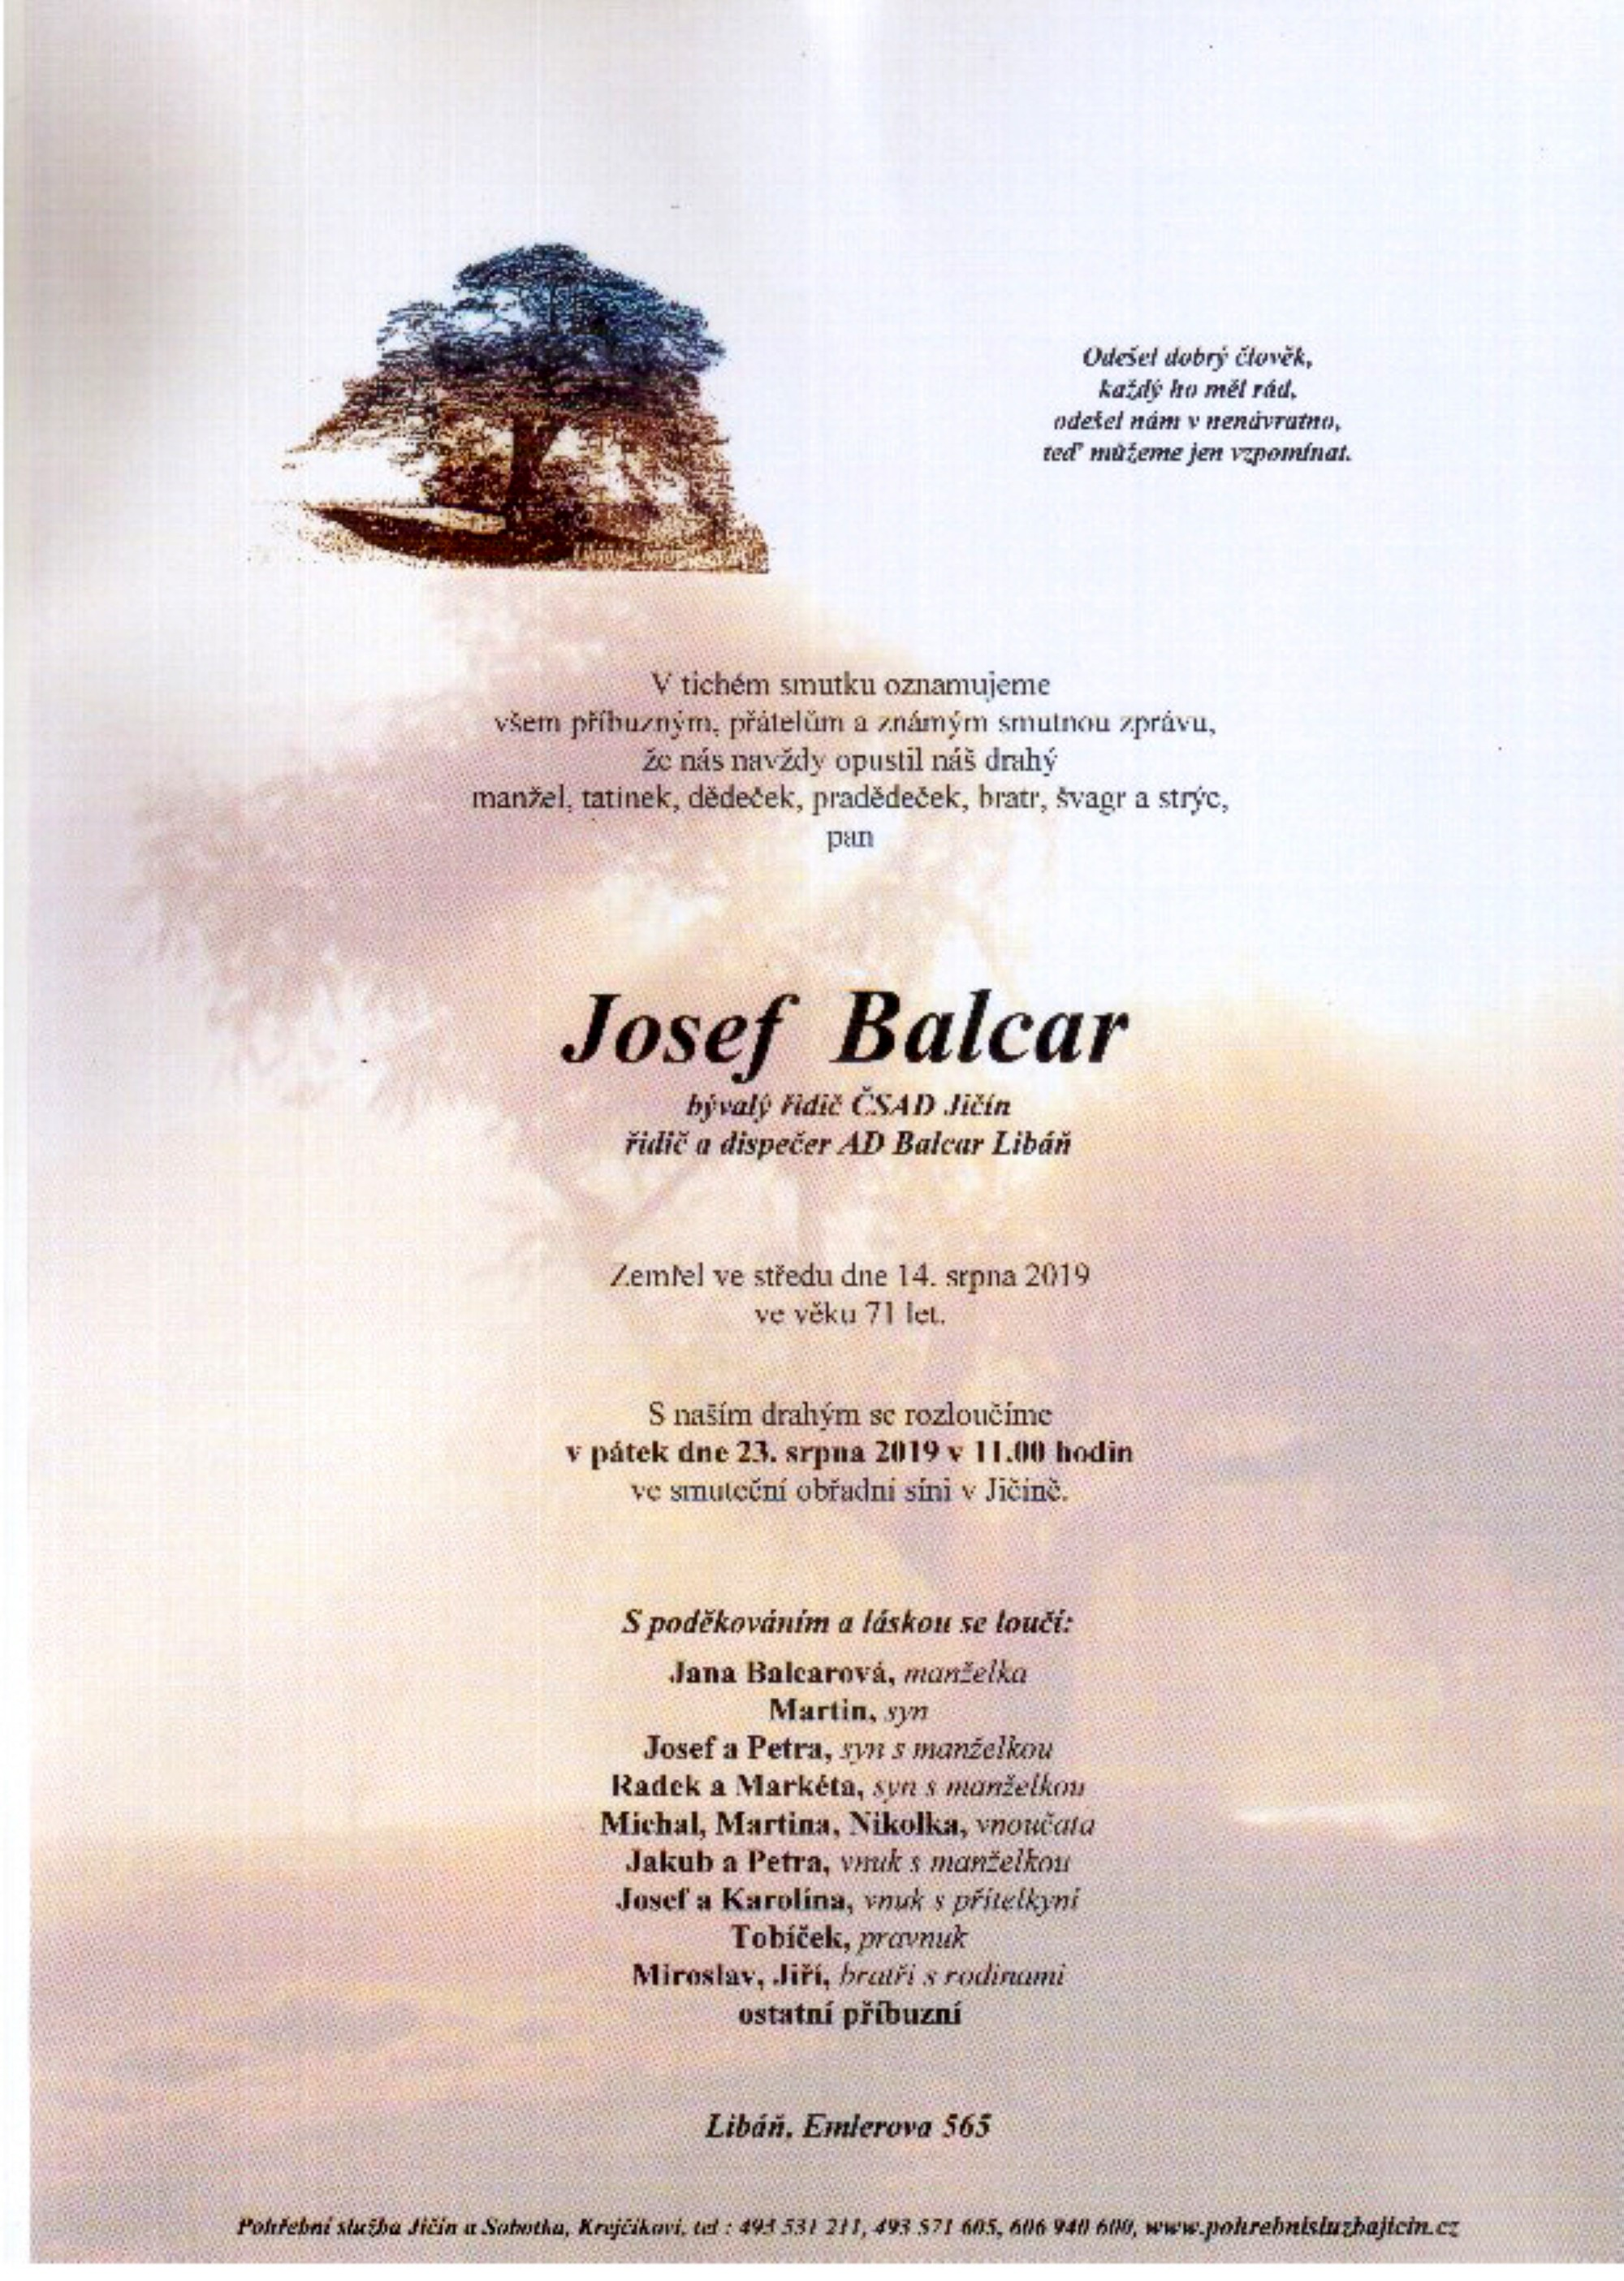 Josef Balcar